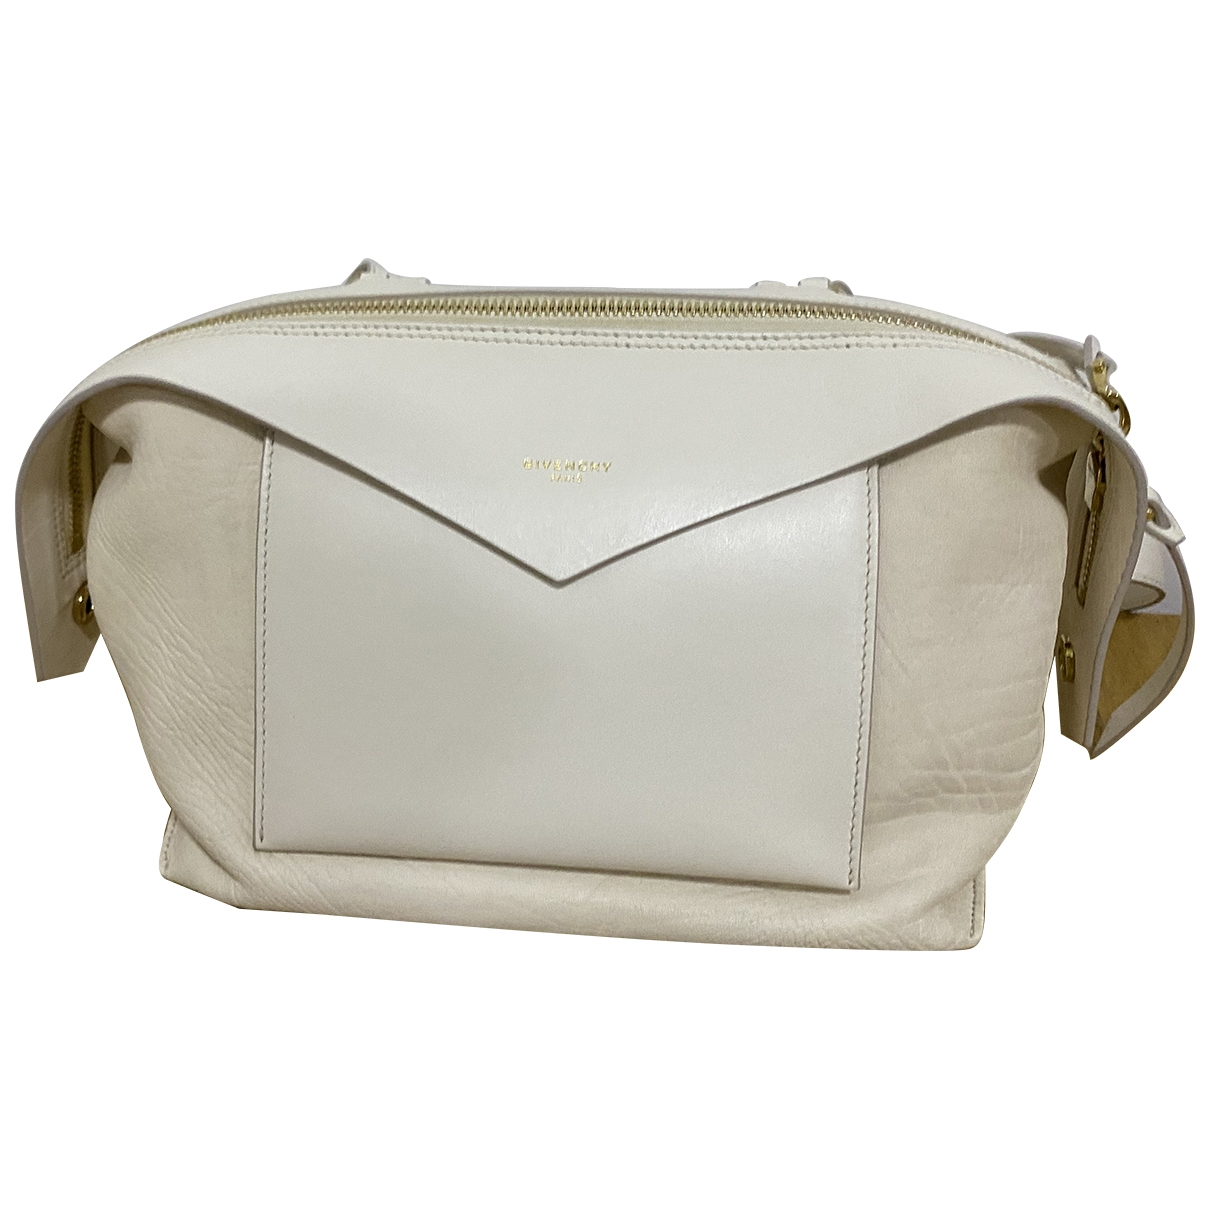 Givenchy Sway Ecru Leather handbag for Women \N